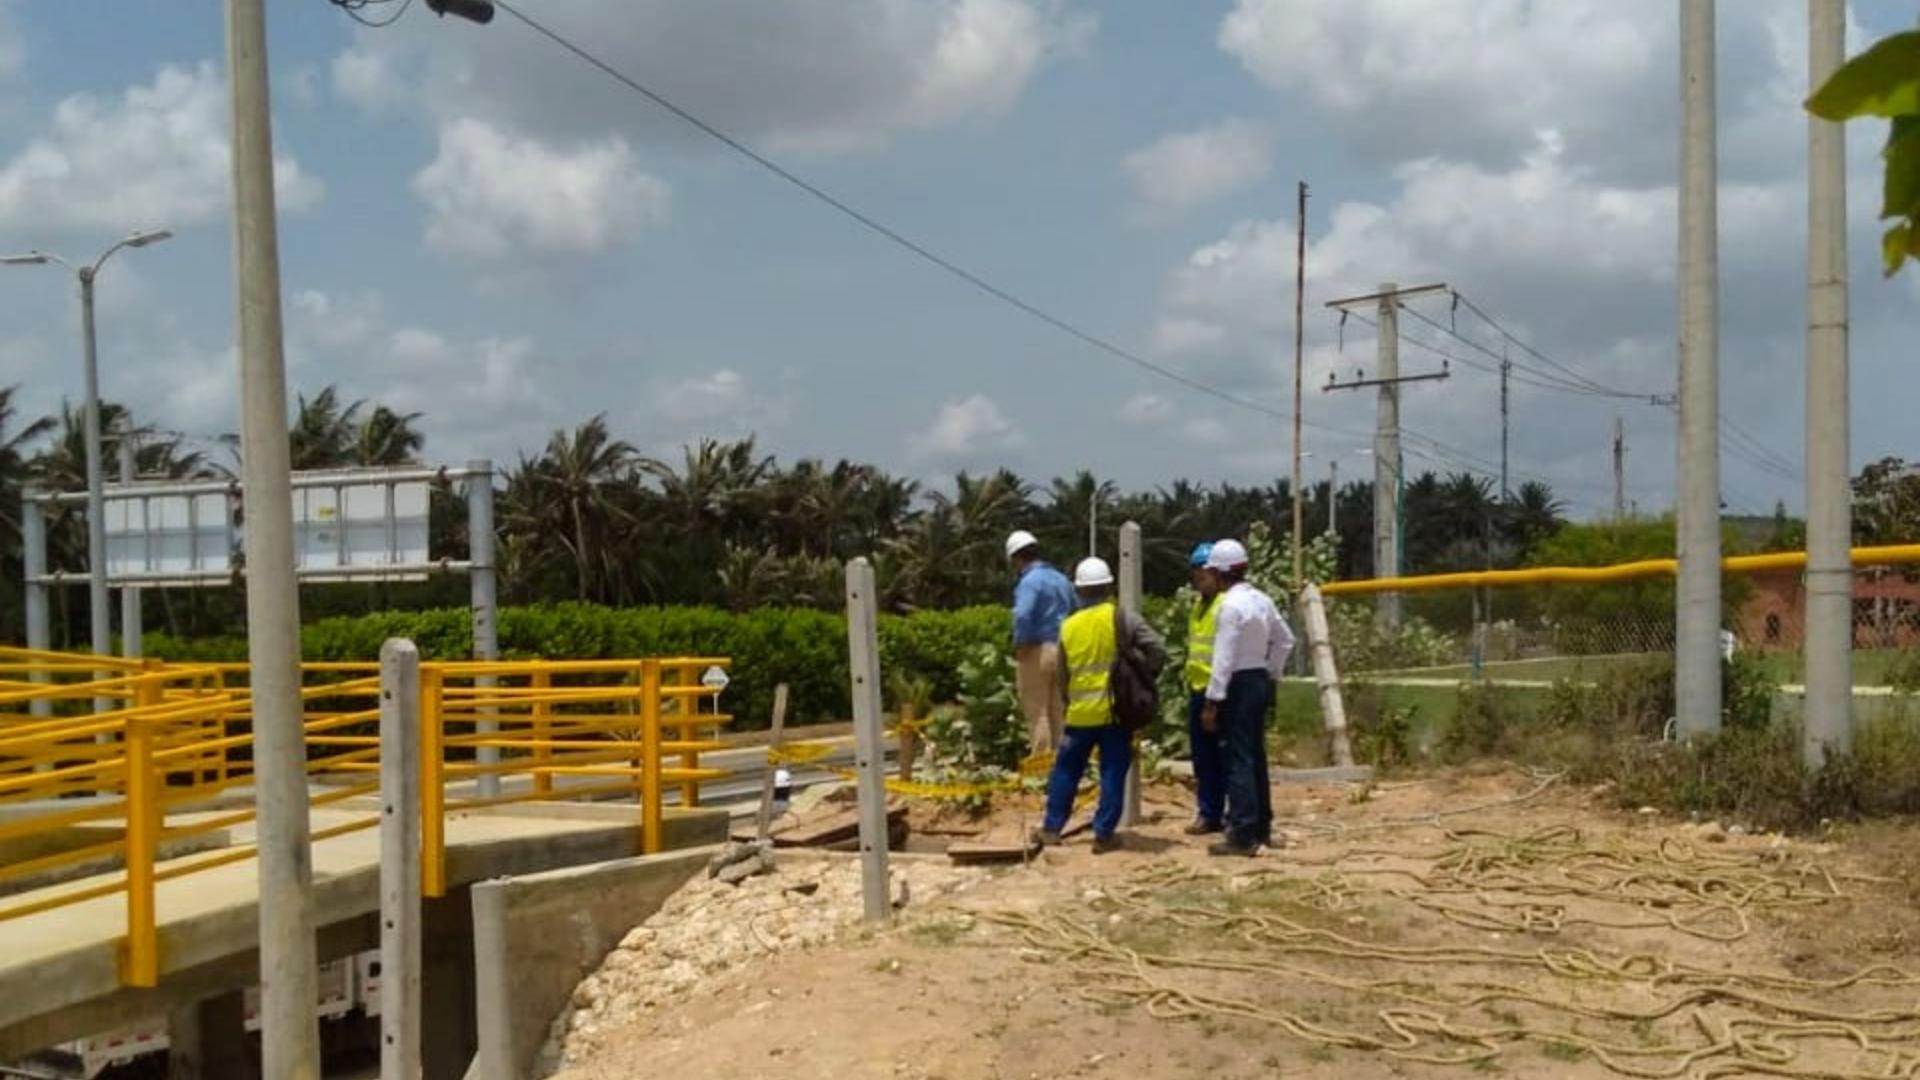 Técnicos de Electricaribe a la altura del Polideportivo de Uniautónoma.